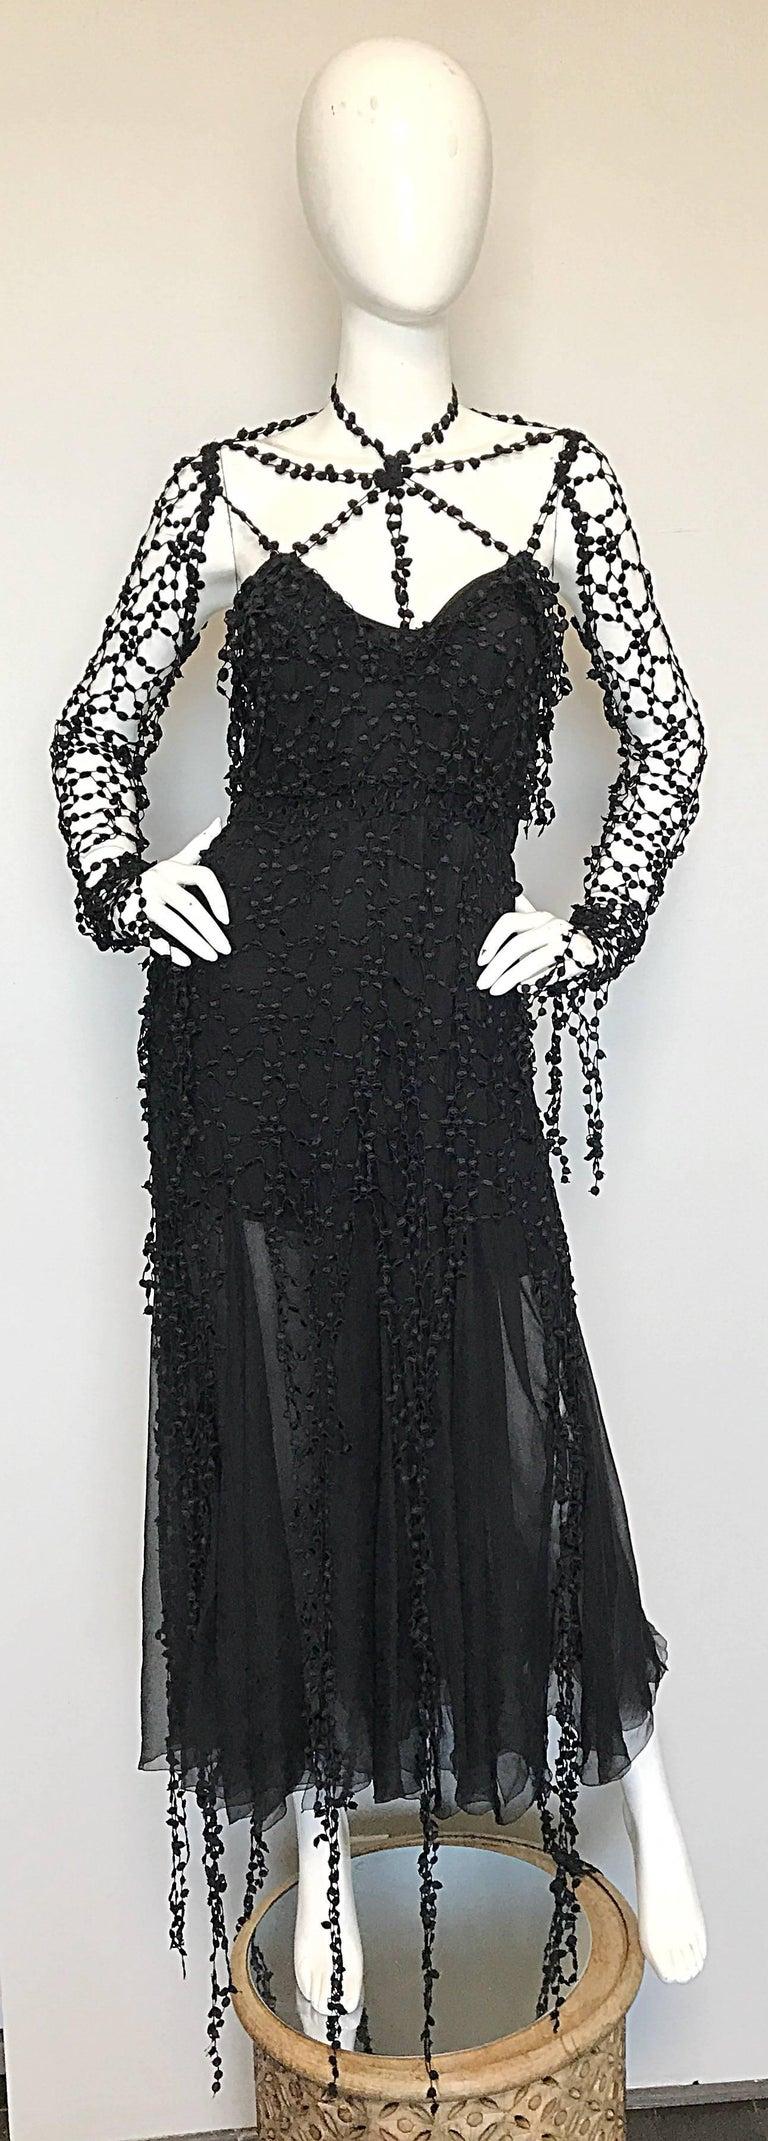 1990s Karl Lagerfeld Vintage ' Spiderweb ' Black Silk Chiffon Vintage 90s Dress For Sale 5